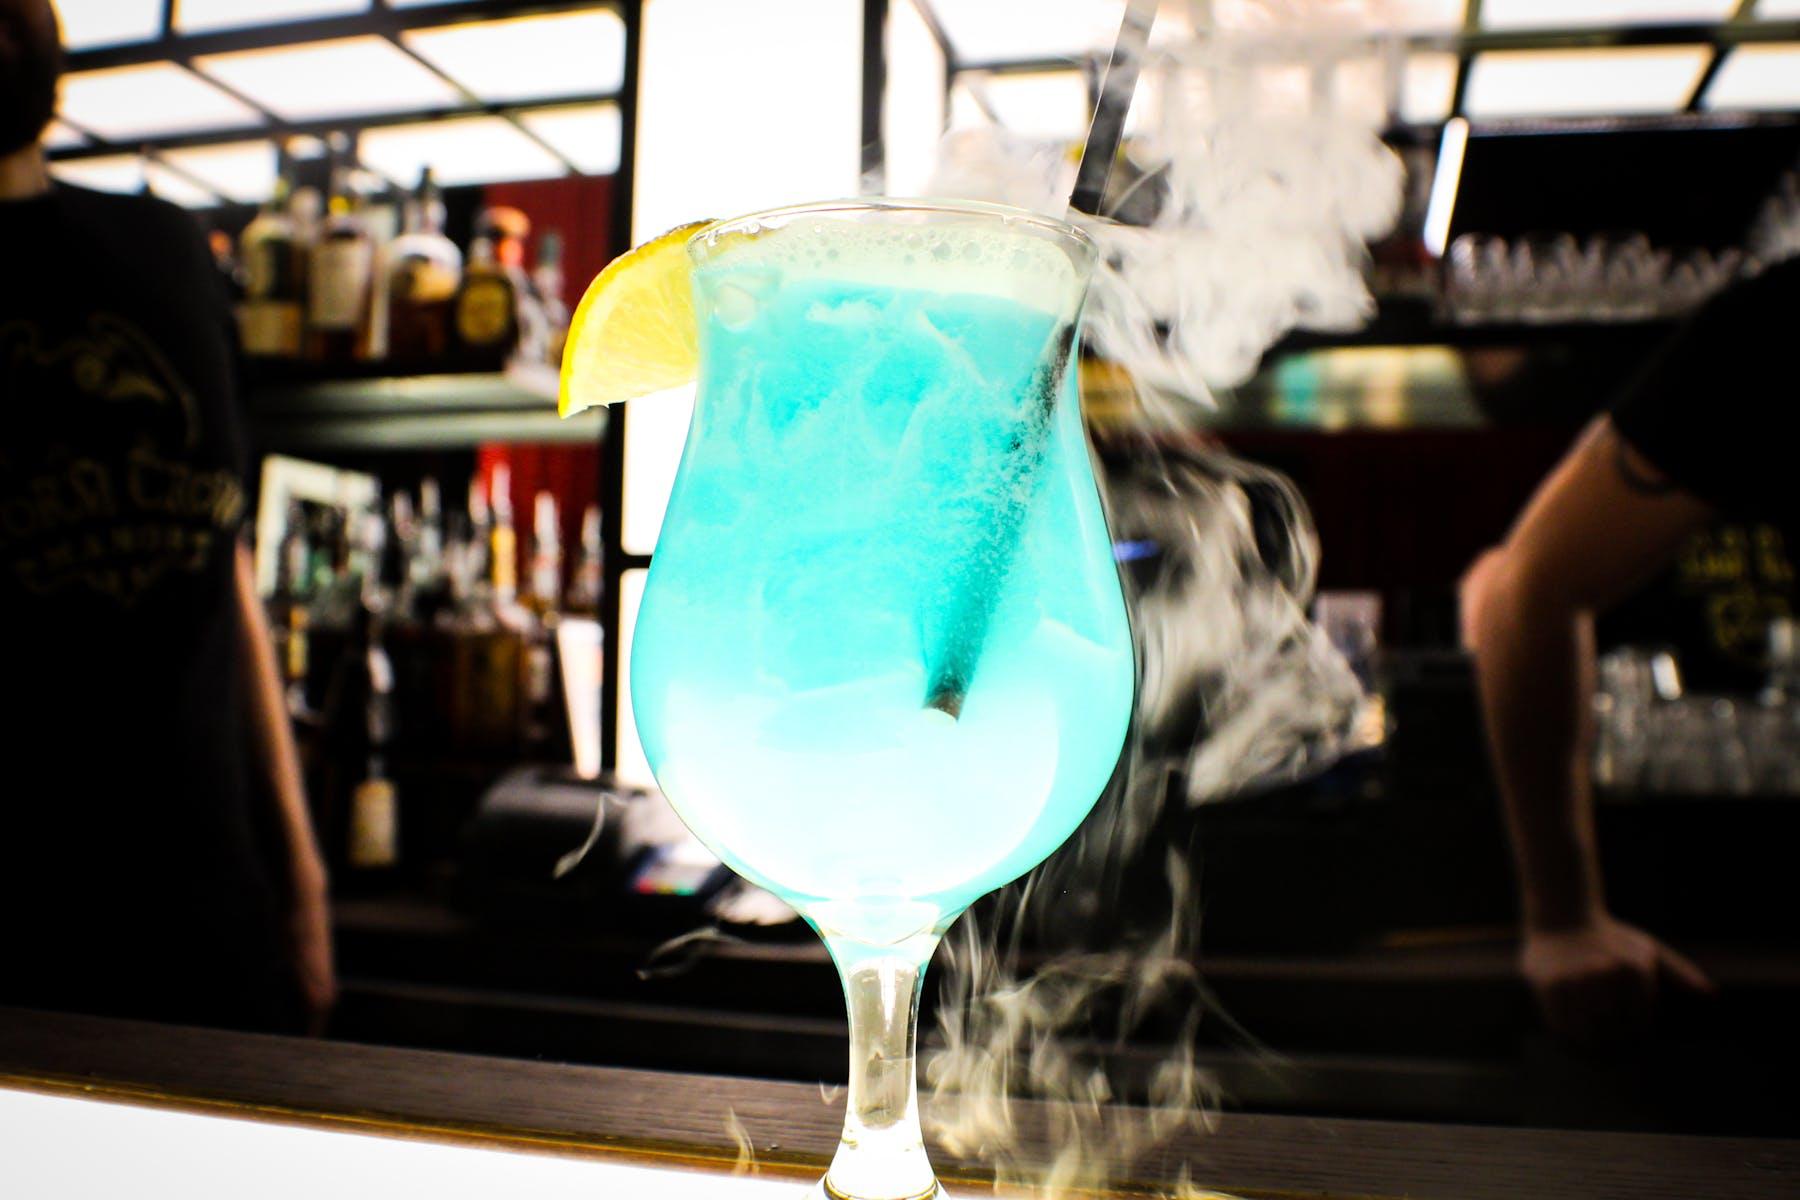 romulan ale bubbling cocktail